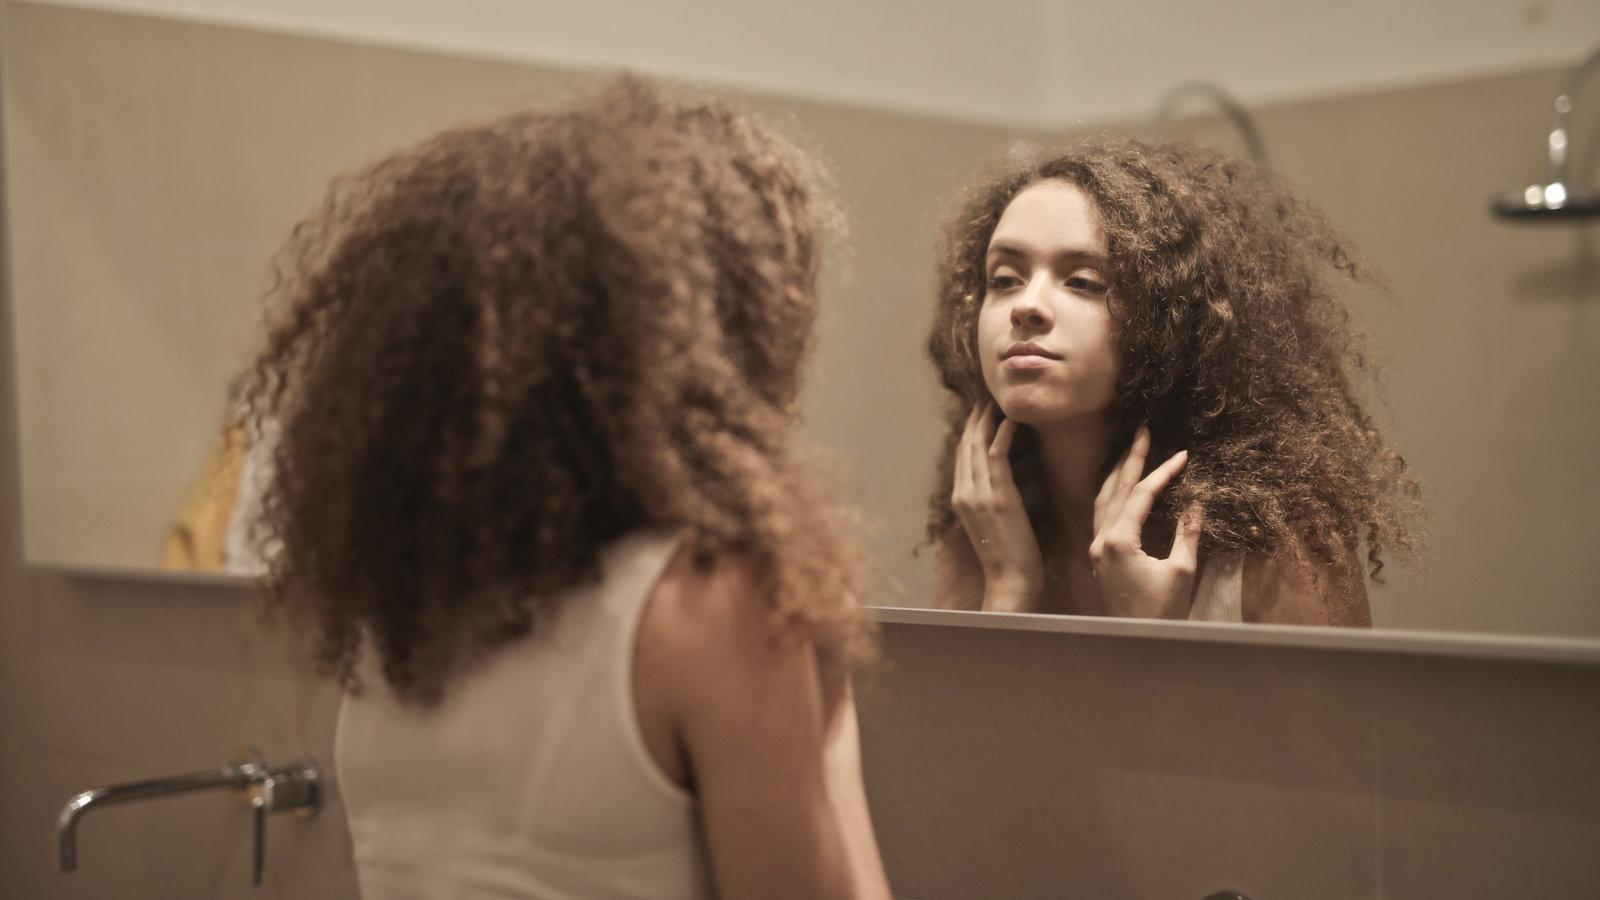 teen girl looking in the mirror